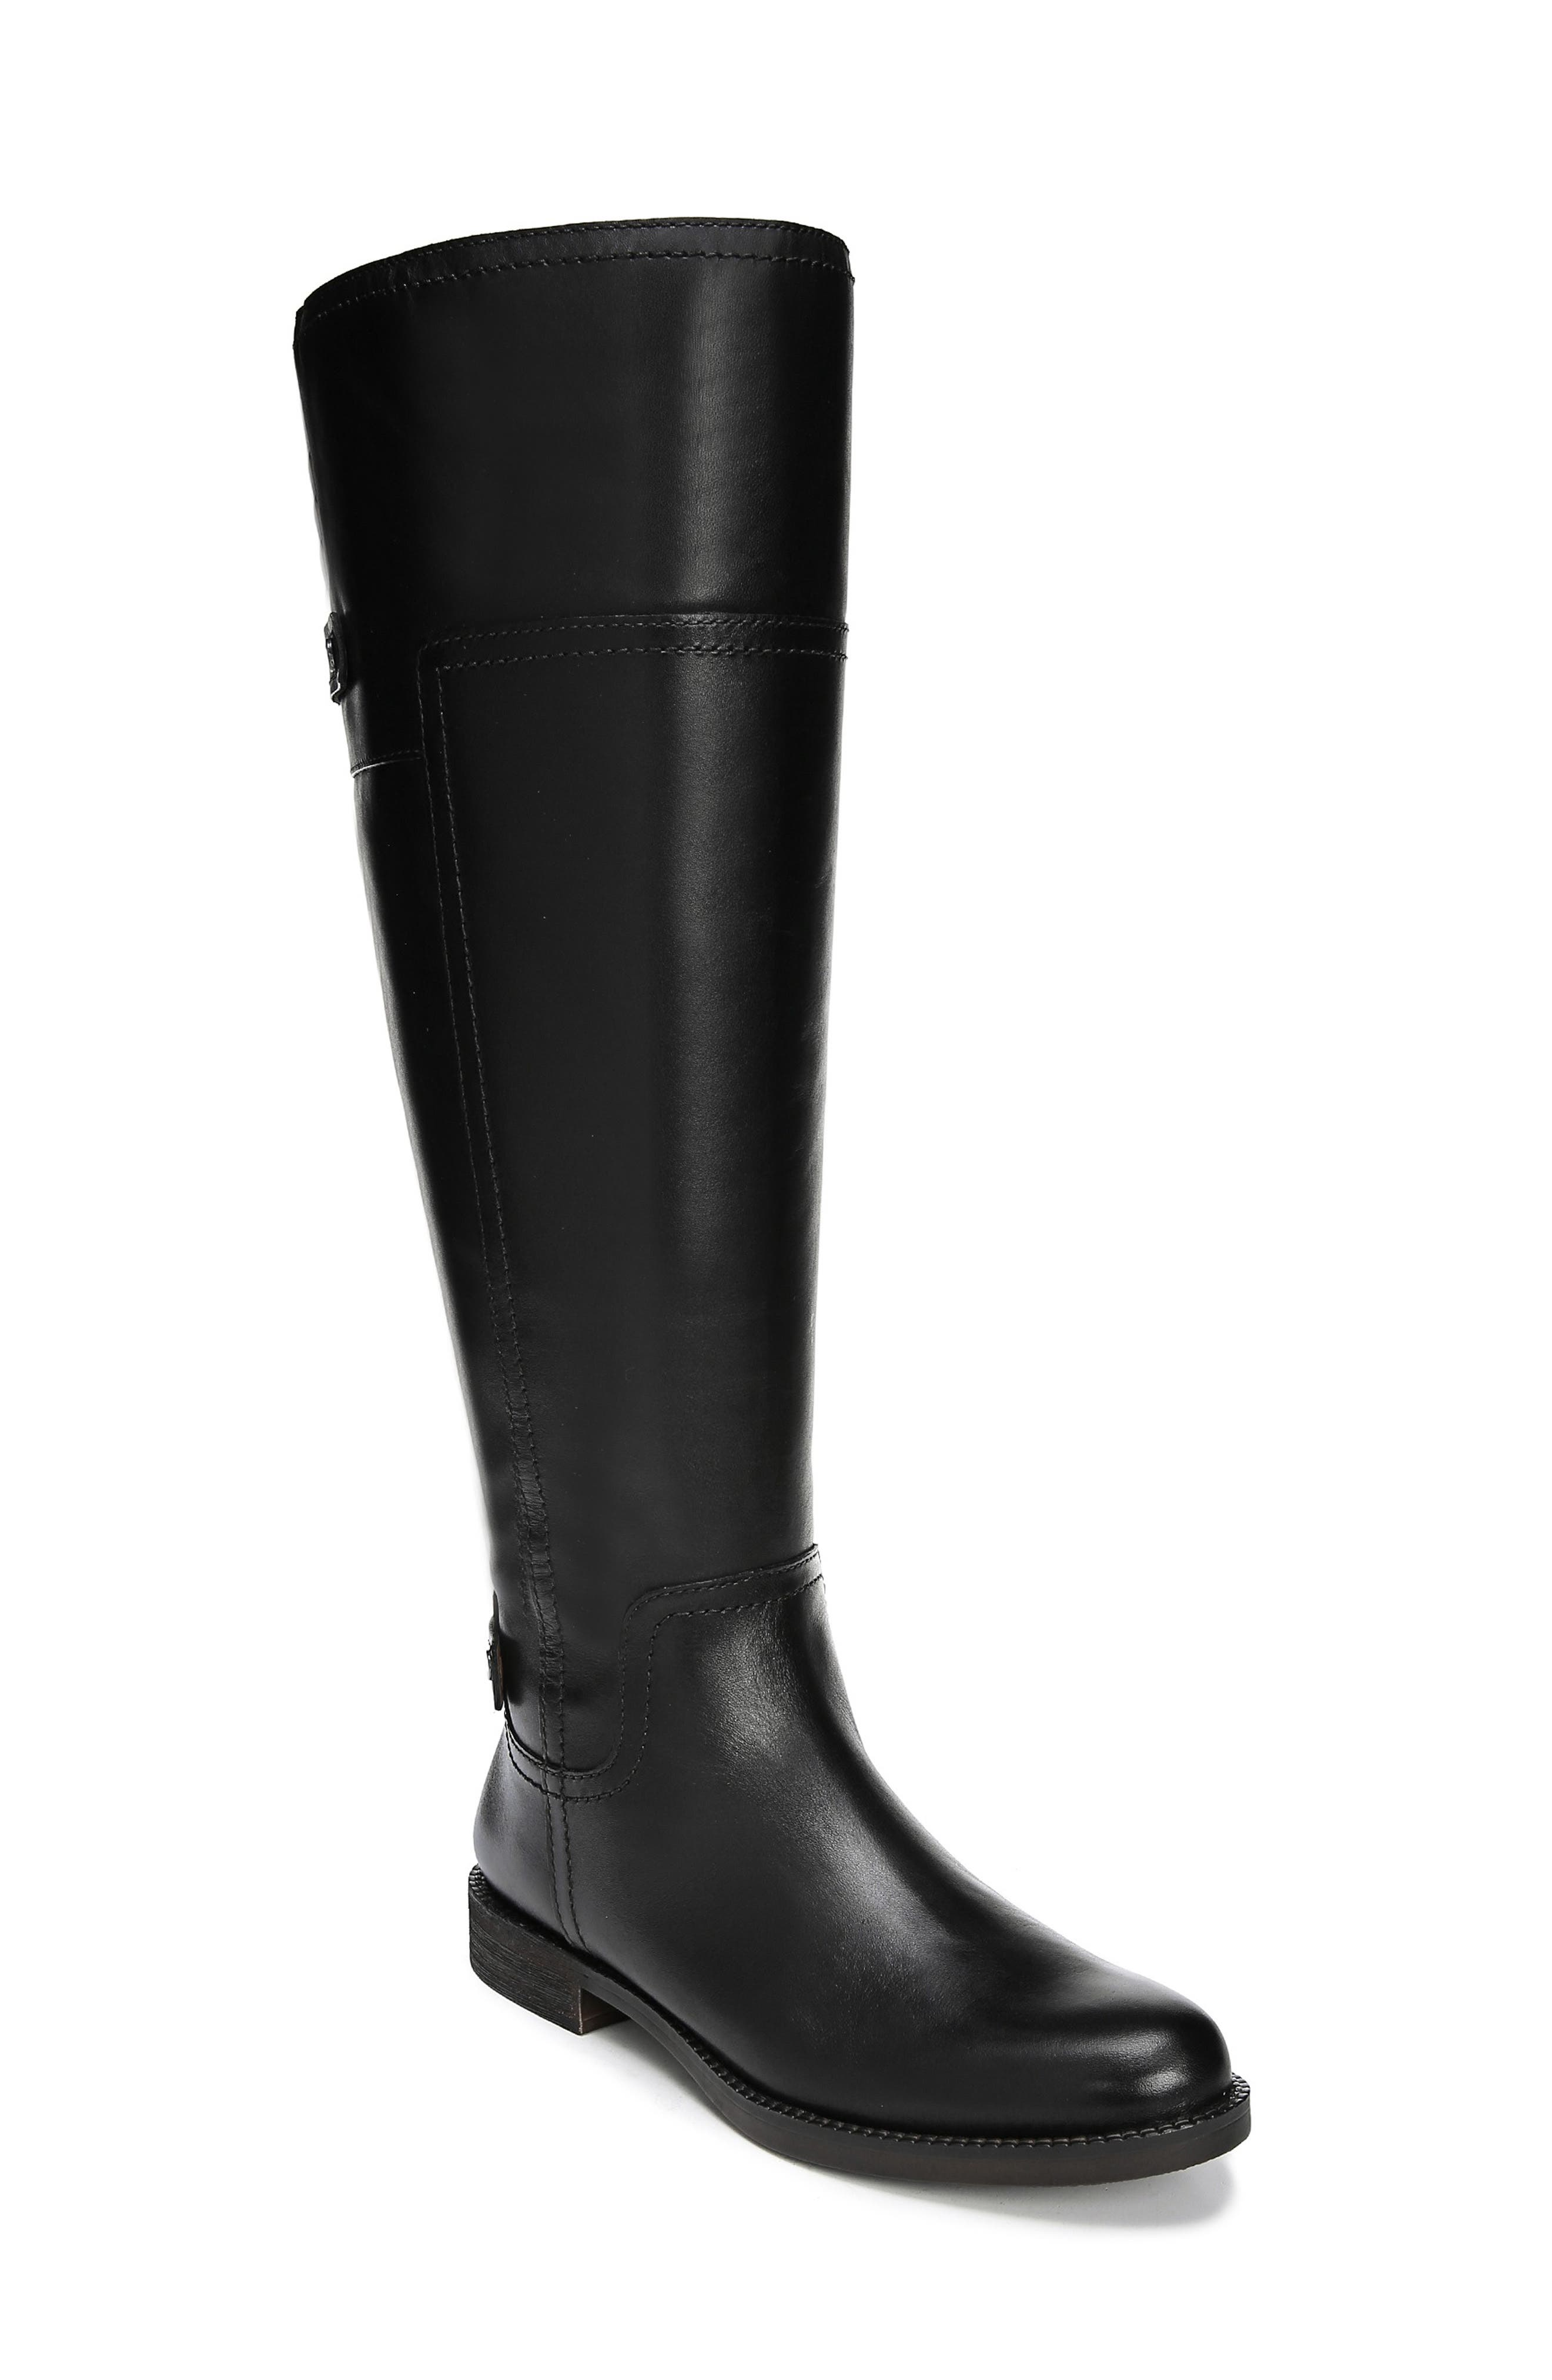 Franco Sarto Capitol Riding Boot Regular Calf- Black